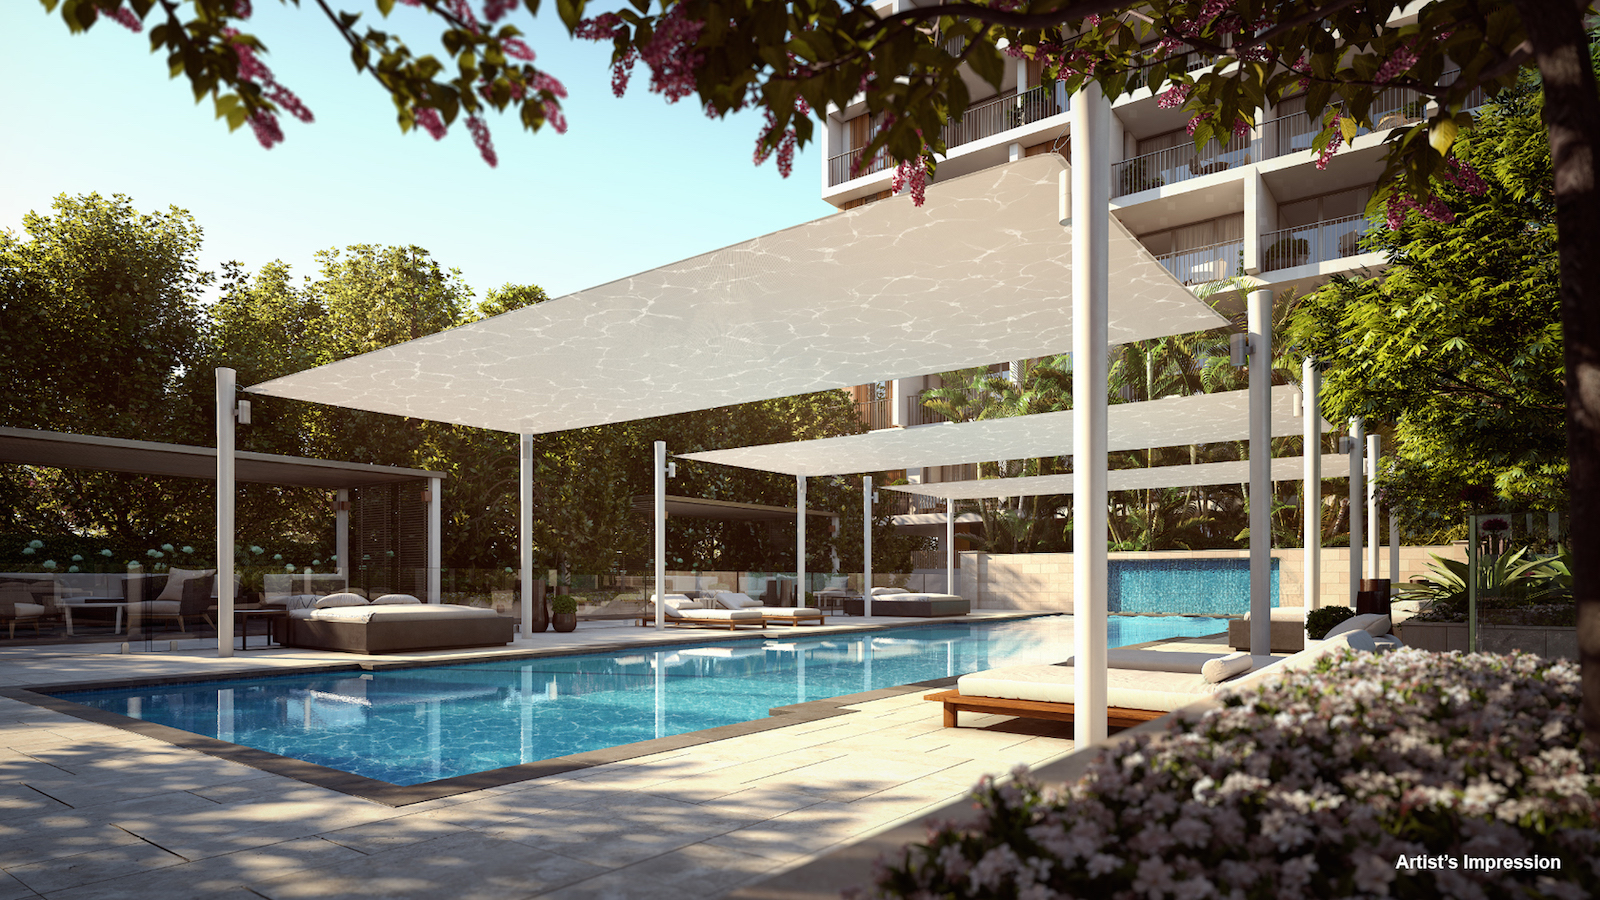 Palisade swimming pool